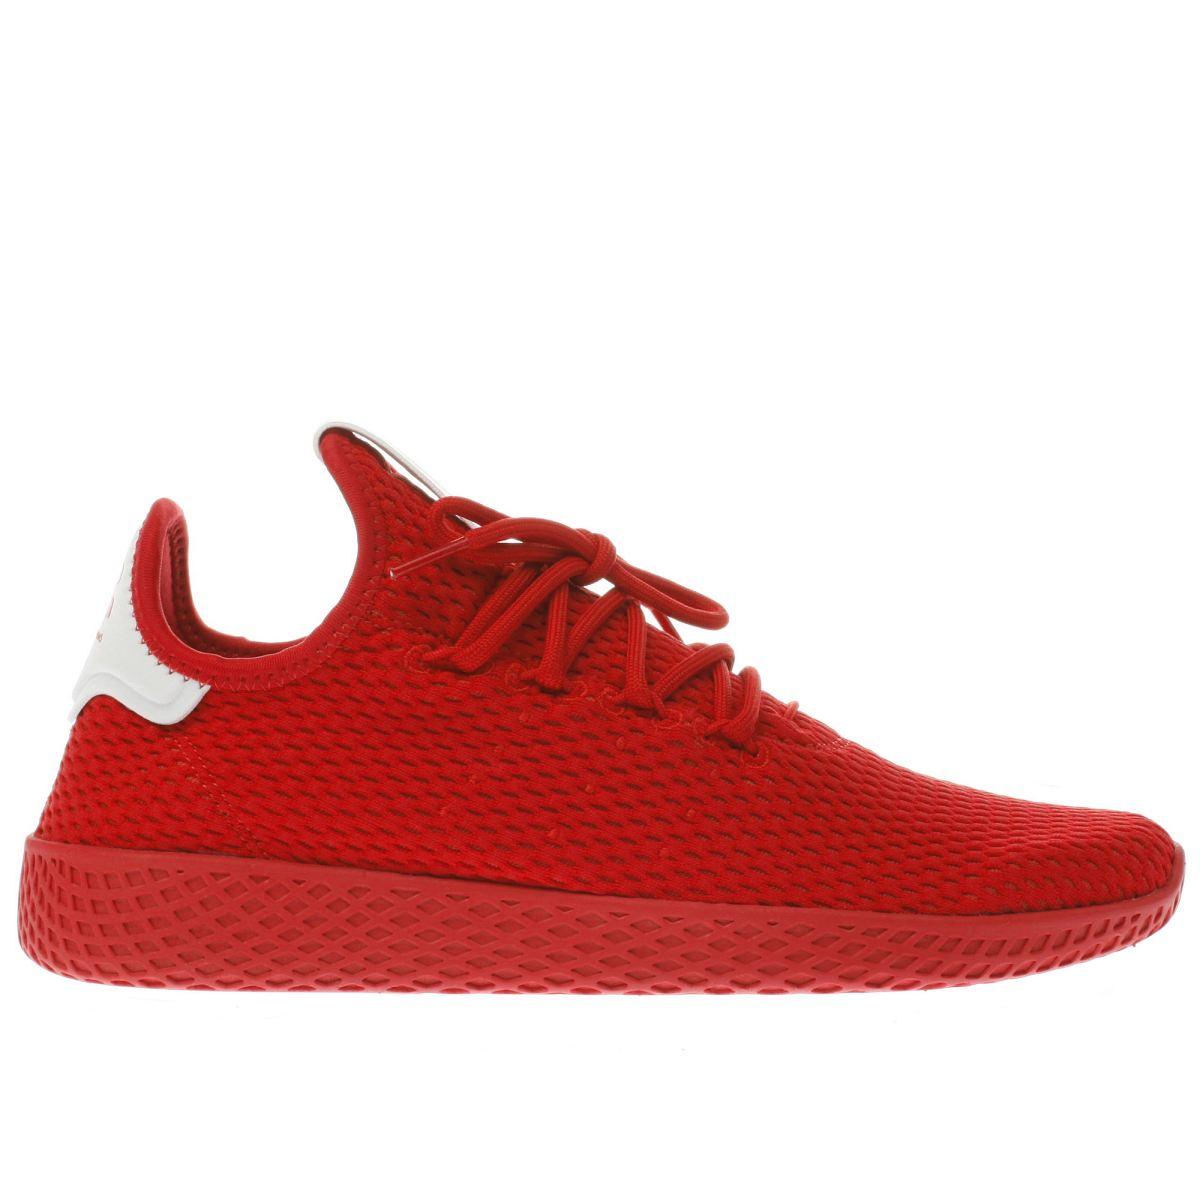 adidas red pharrell williams tennis hu trainers